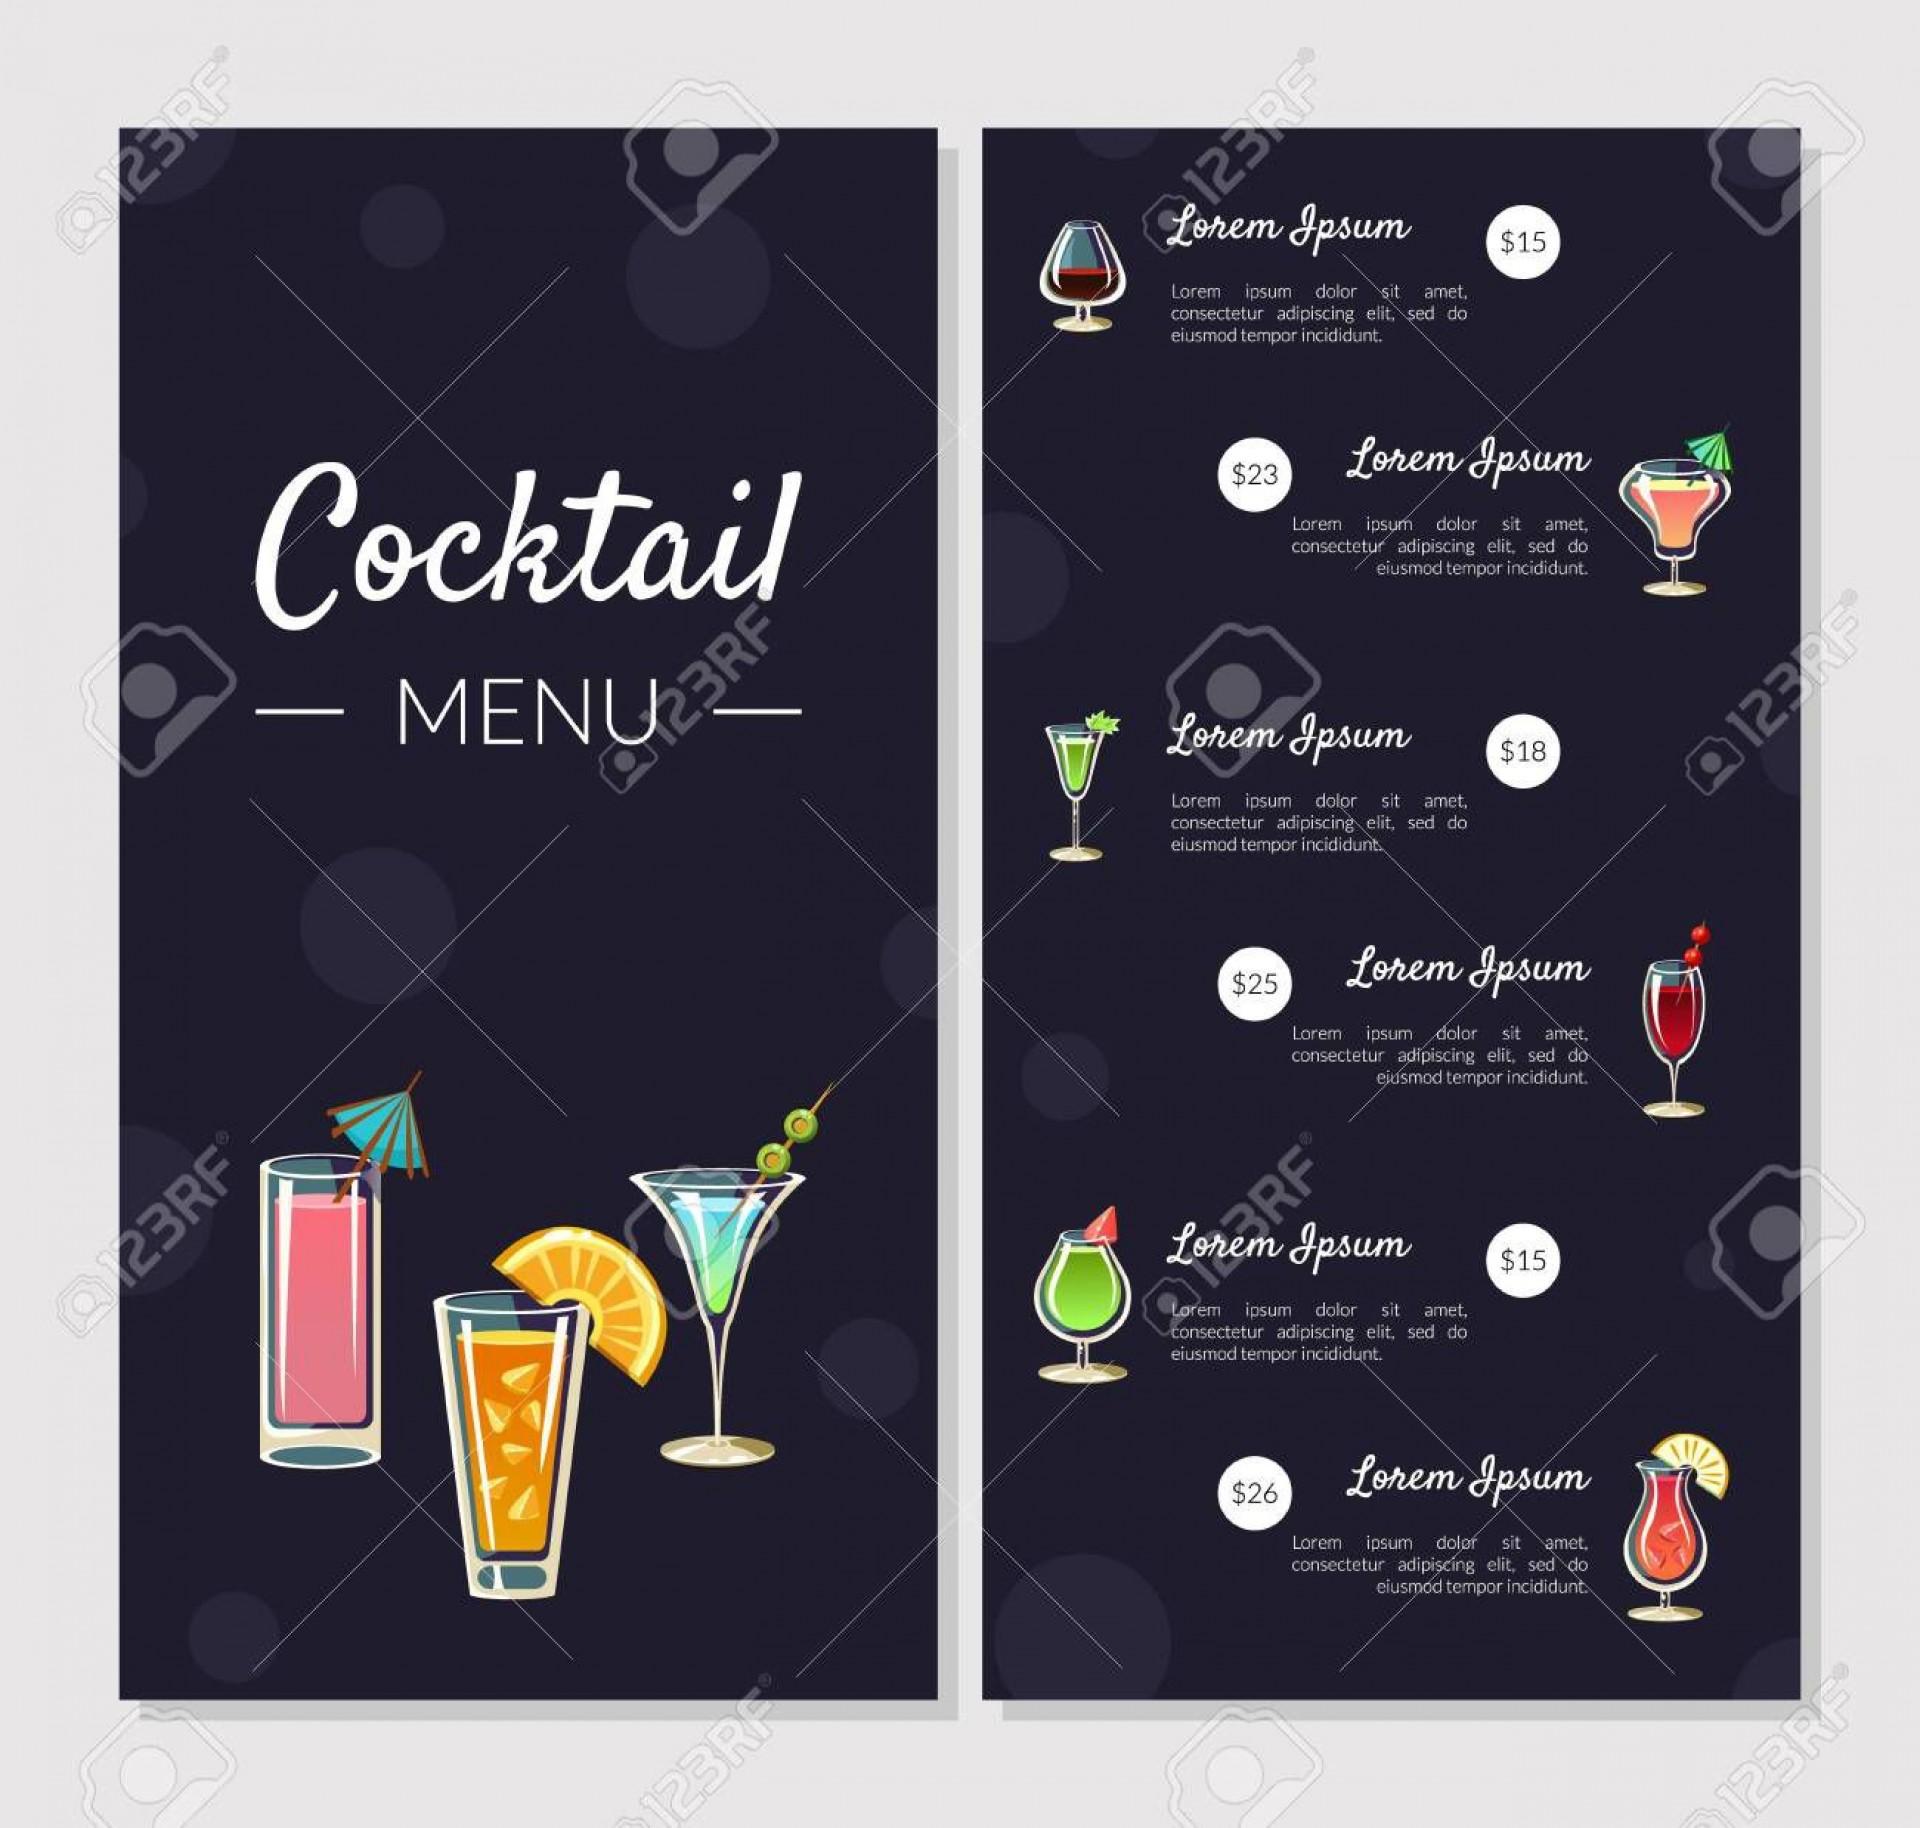 003 Shocking Bar Menu Template Free Concept  Download Snack1920